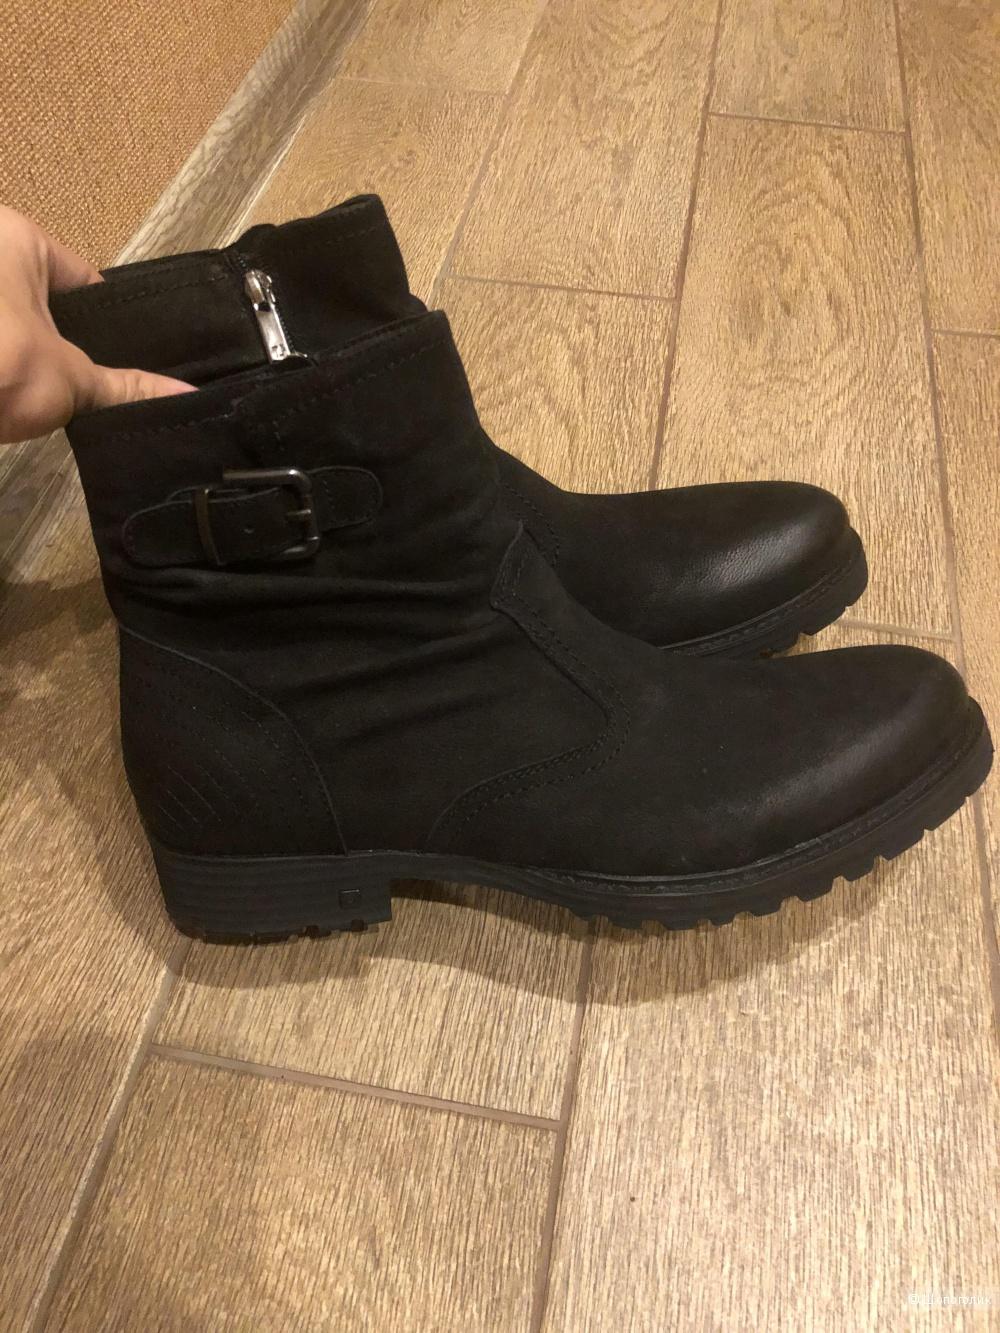 Зимние ботинки Tj collection, 45 р.